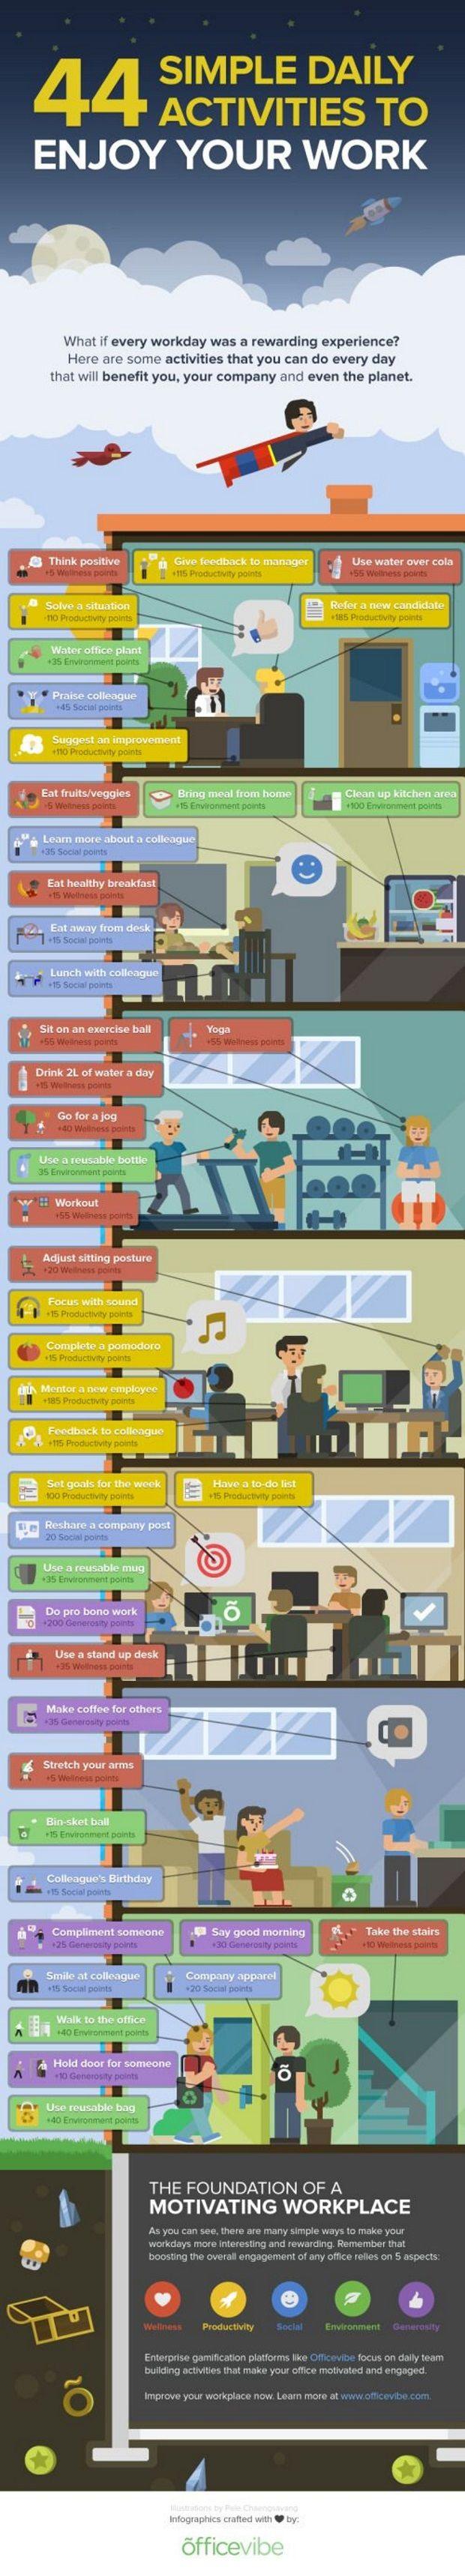 44 Simple Ways to Find Joy at Work